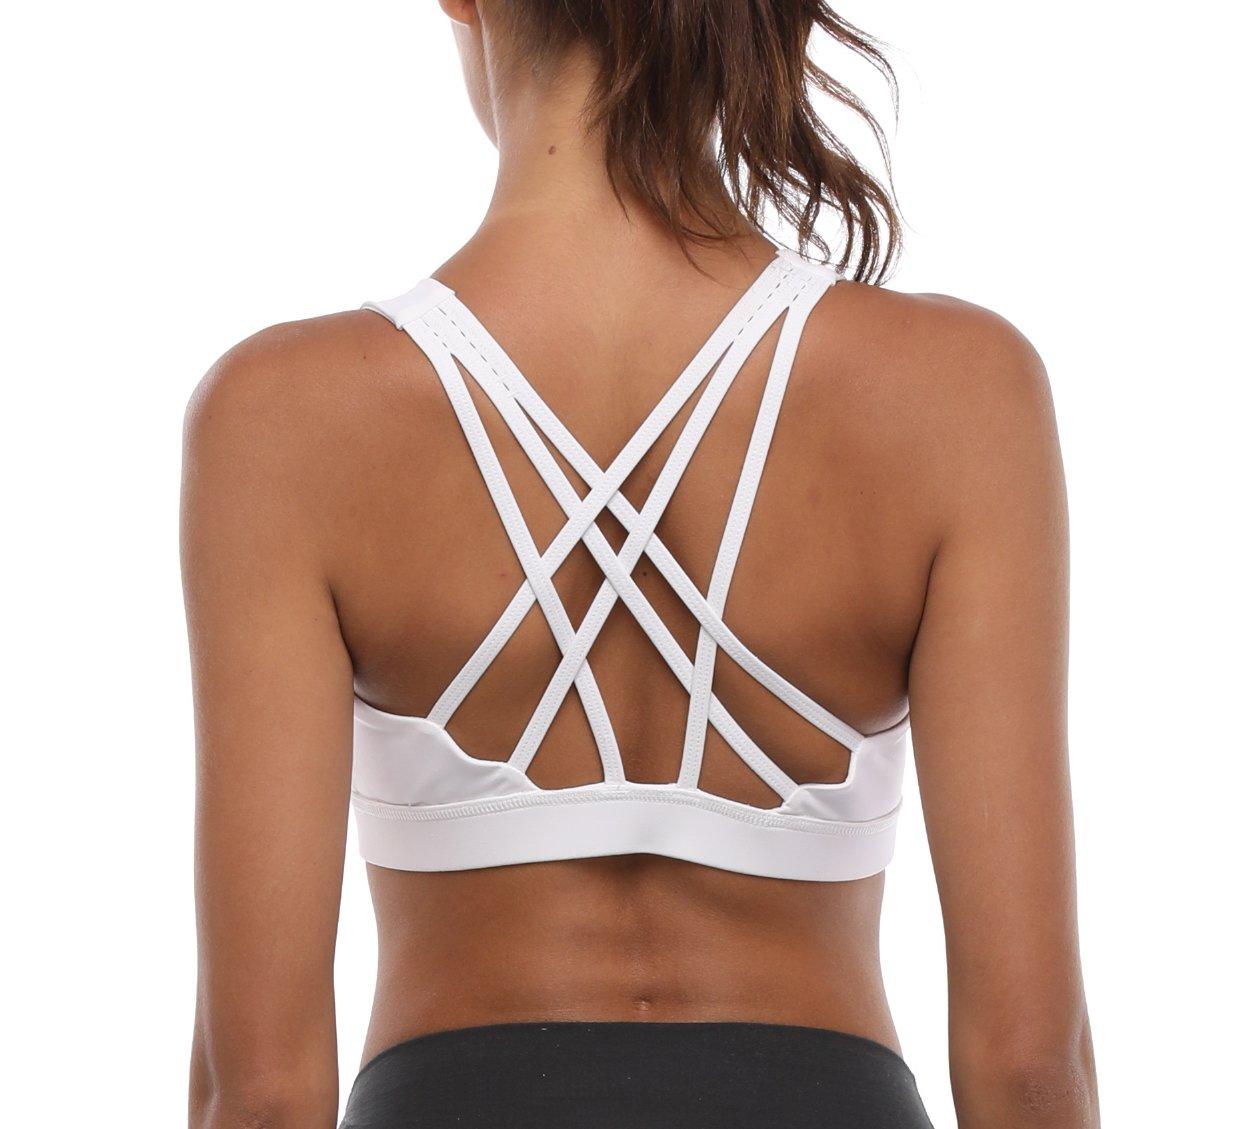 Women's Sports Bra Strappy Activewear Workout Racerback Yoga Bra